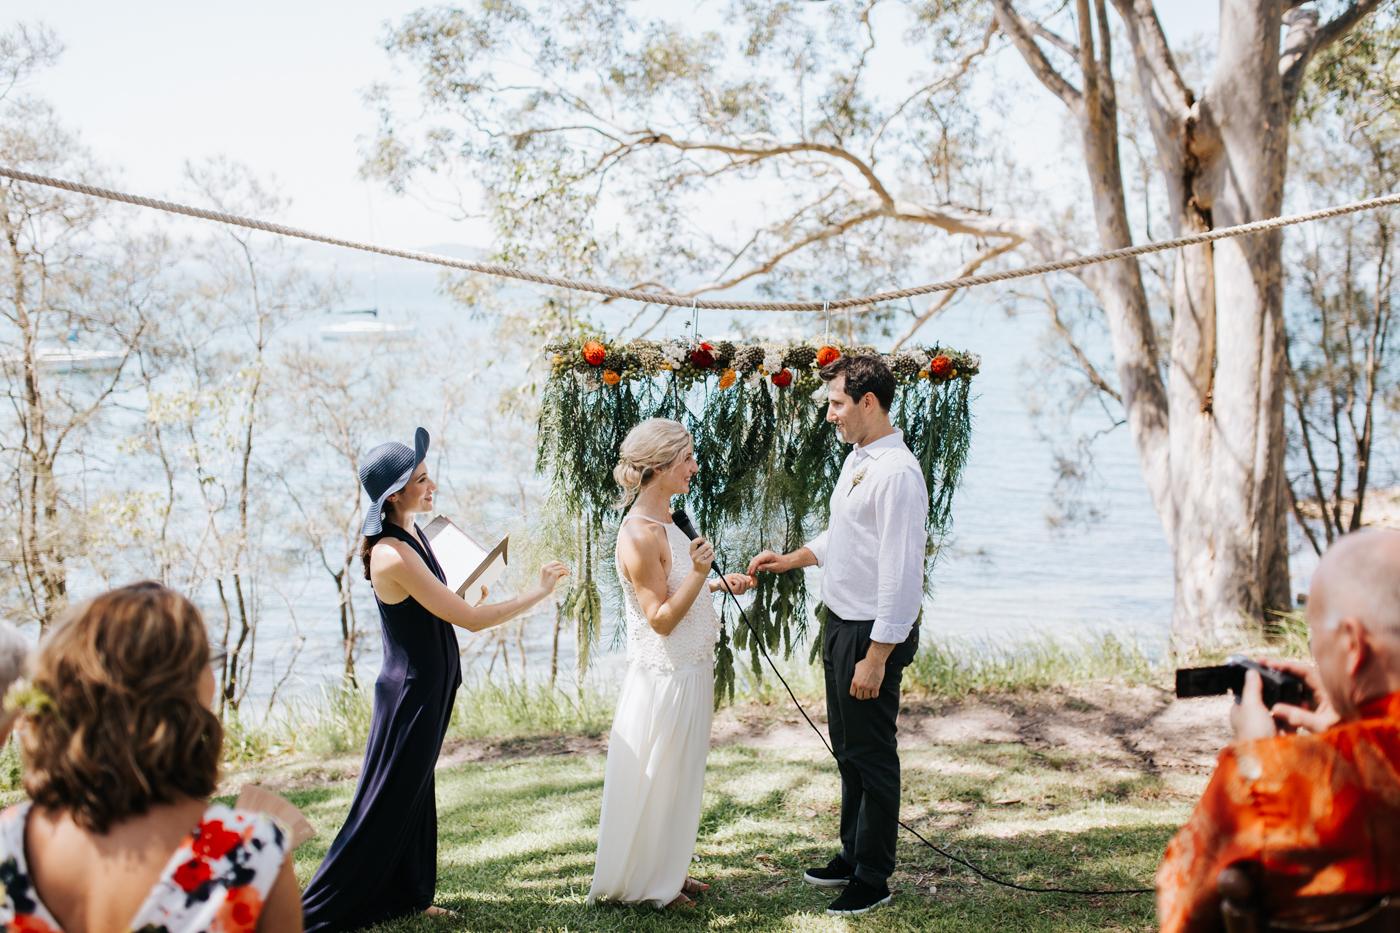 Emma & Ben - Lake Macquarie - Hunter Valley Wedding - Samantha Heather Photography-115.jpg